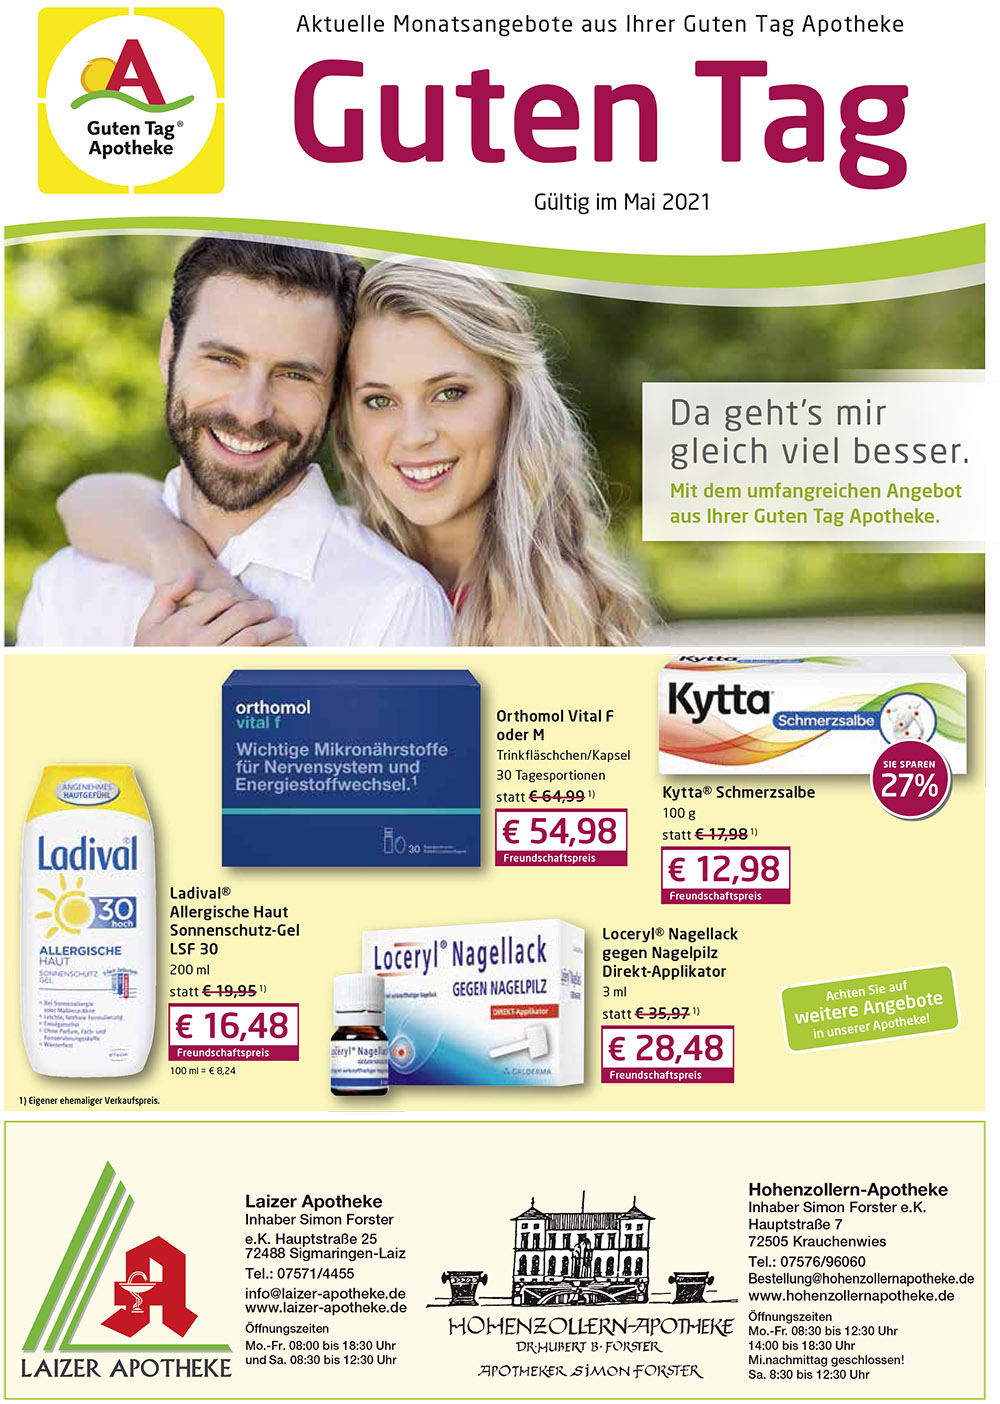 http://www.apotheken.de/fileadmin/clubarea/00000-Angebote/72488_Laizer_Angebote_1.jpg